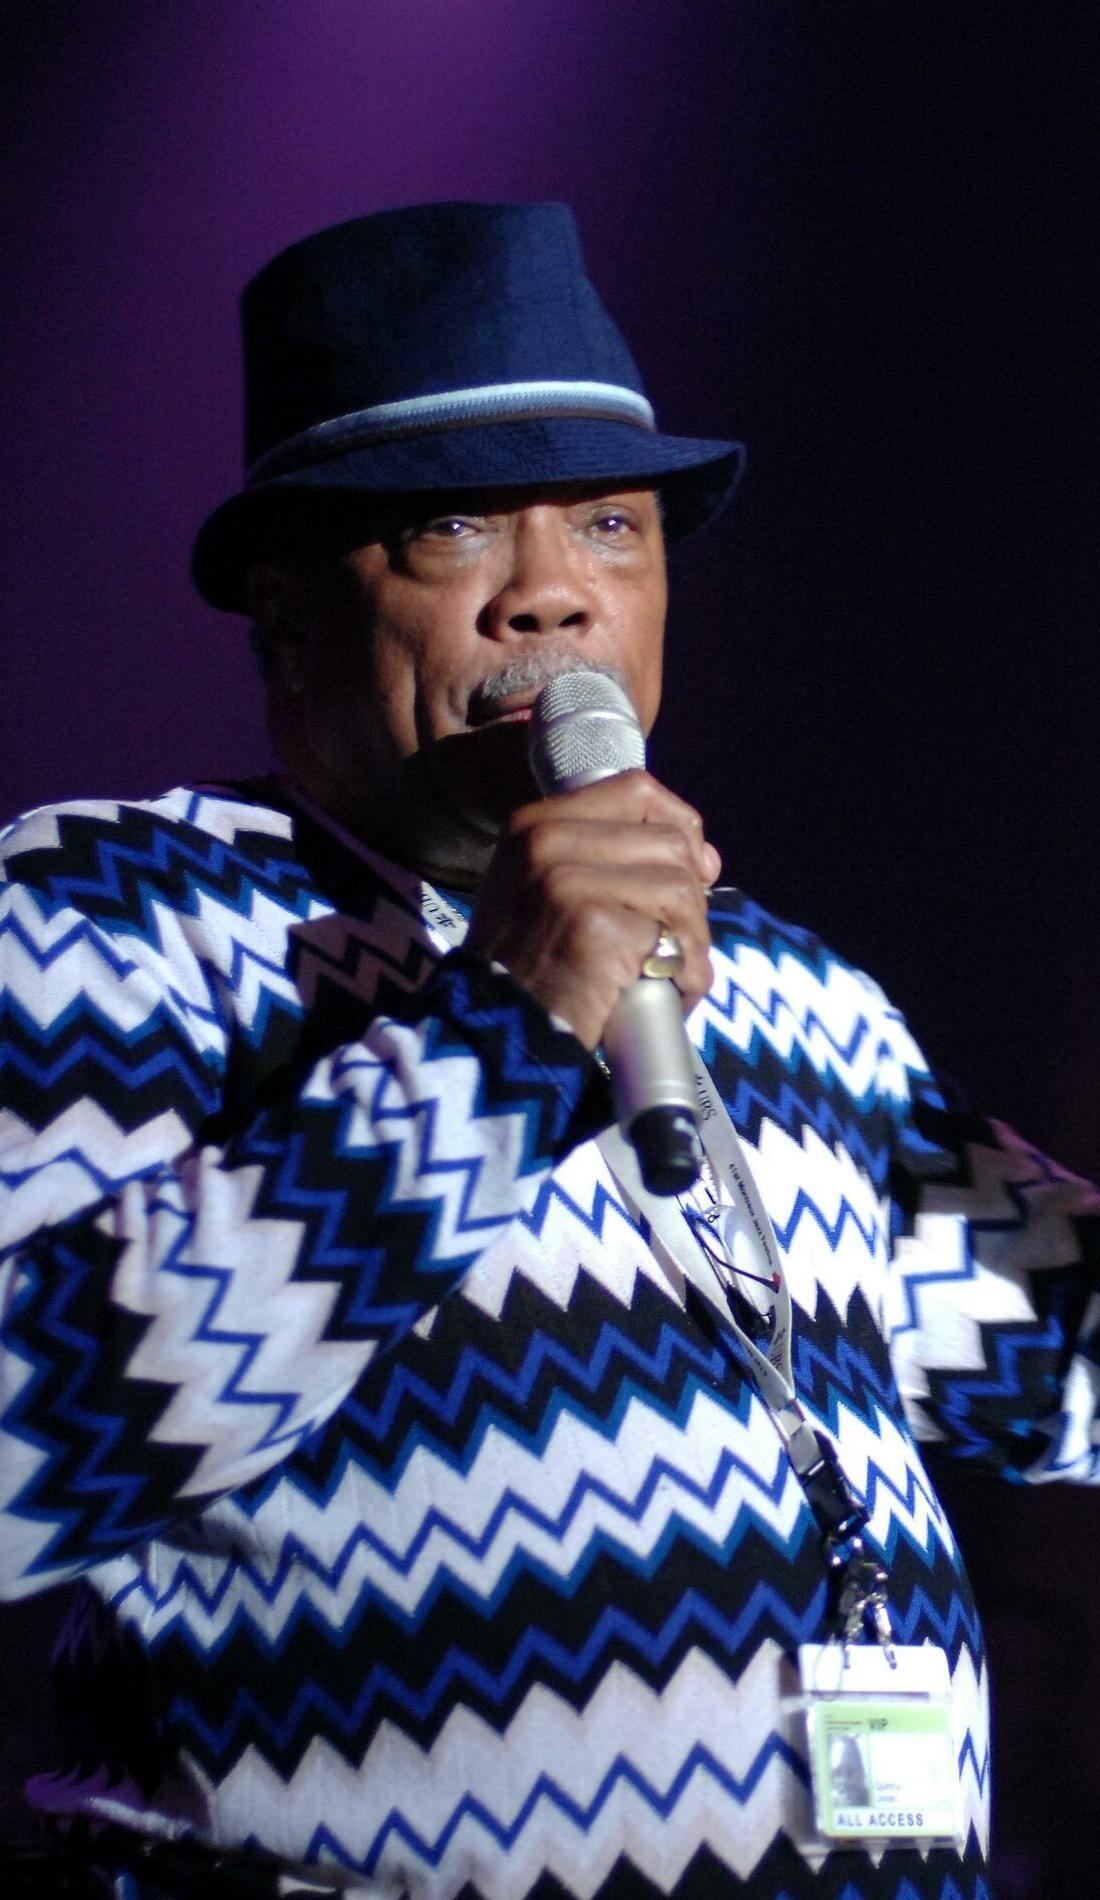 A Quincy Jones live event